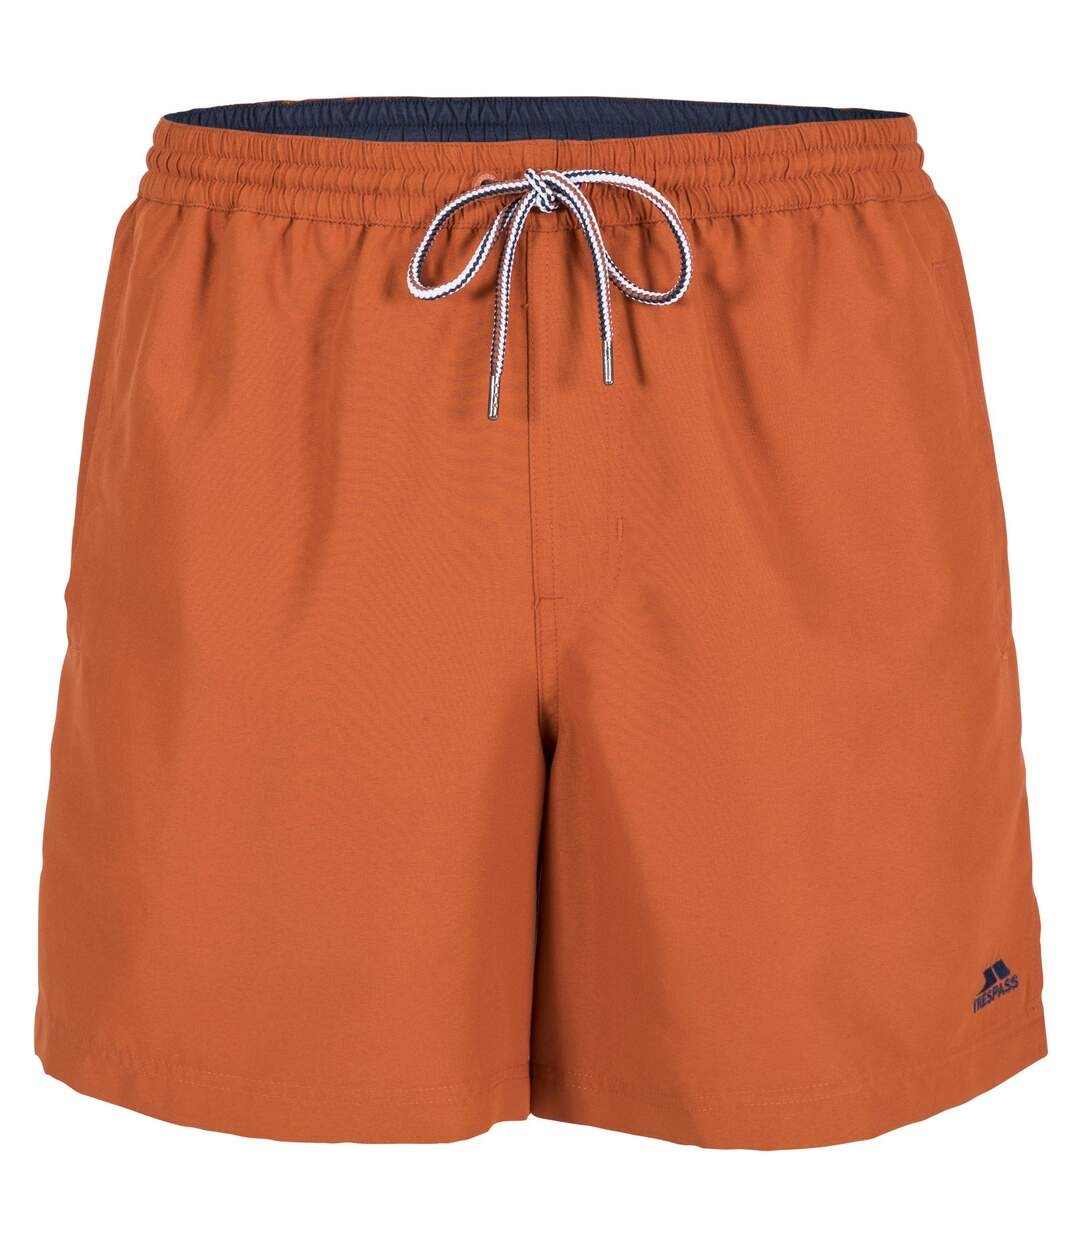 Trespass Mens Granvin Casual Shorts (Burnt Orange) - UTTP3326